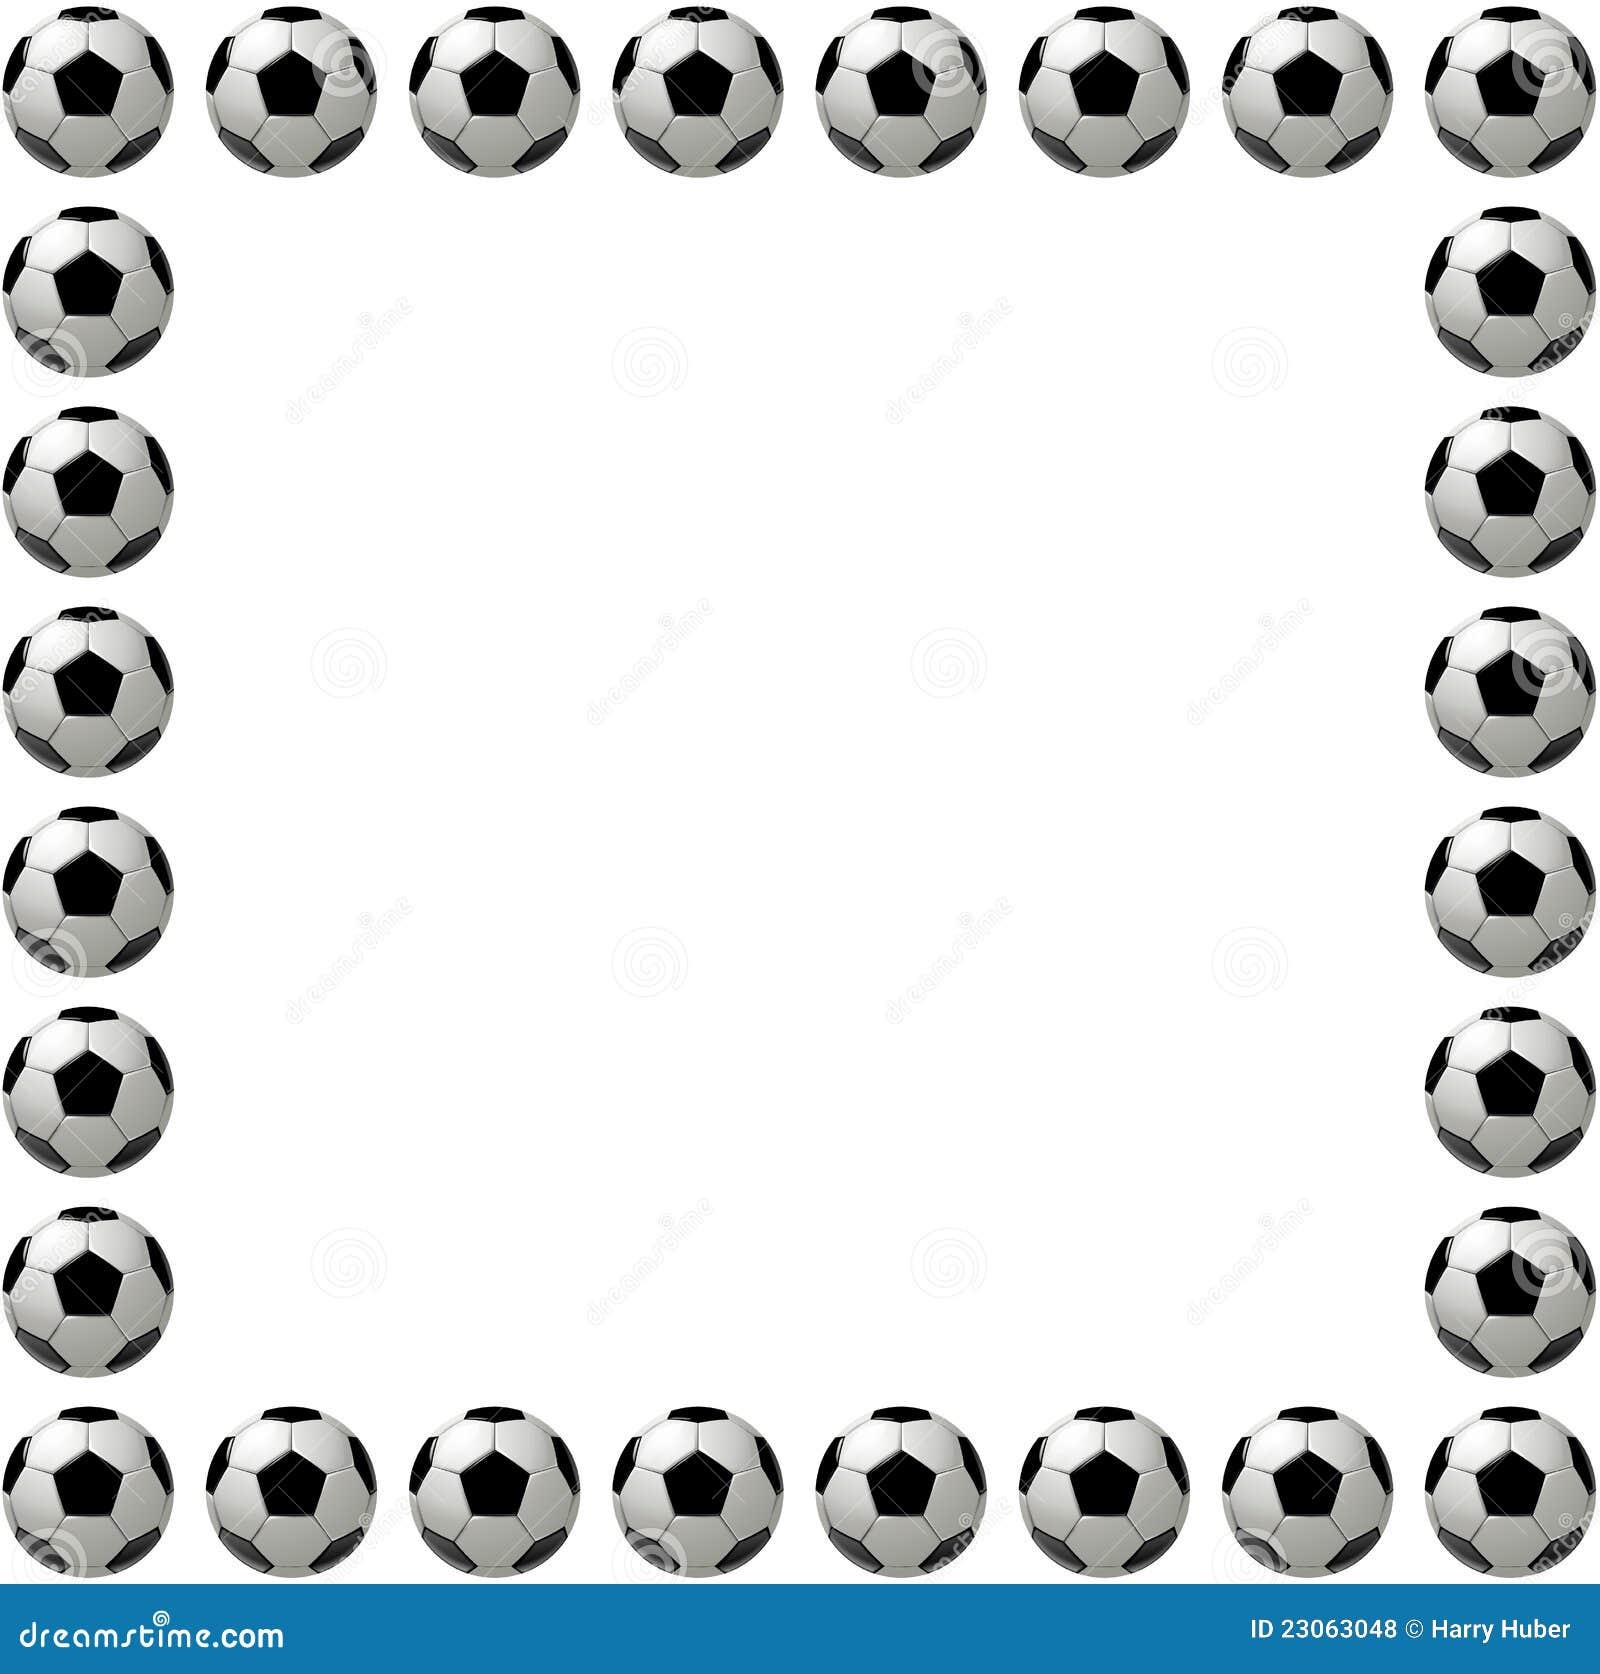 Football Border Clipart Vierkant van de voetbalbal of